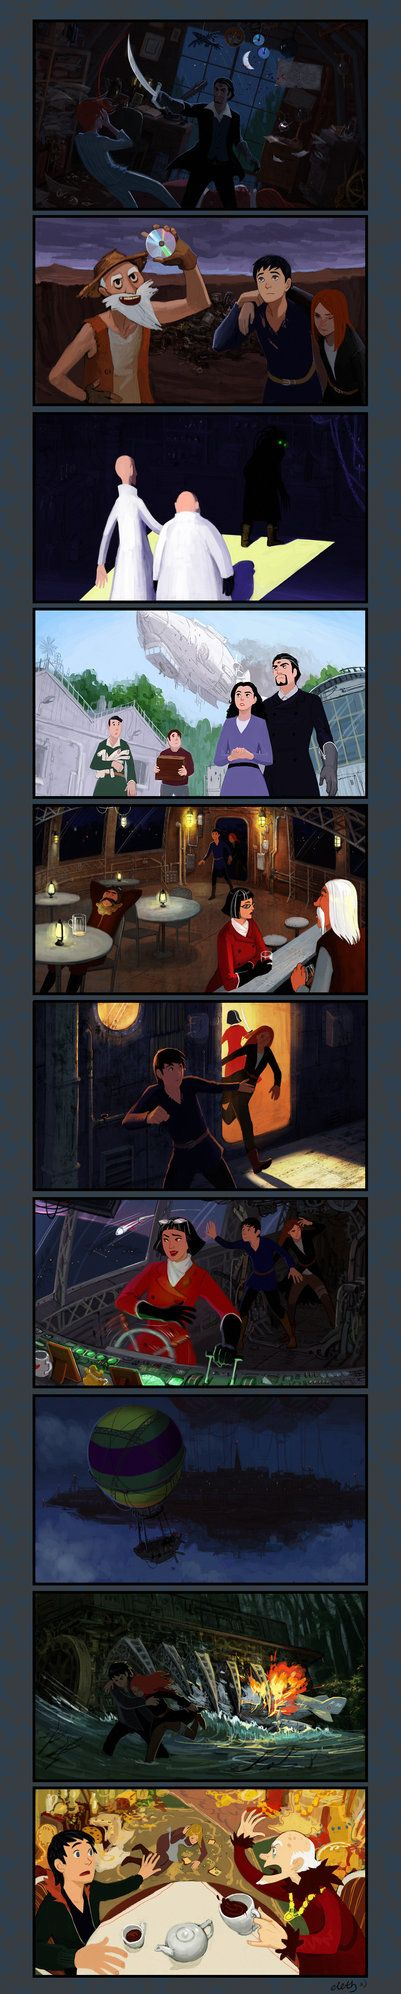 Mortal Engines explication II by eleth89